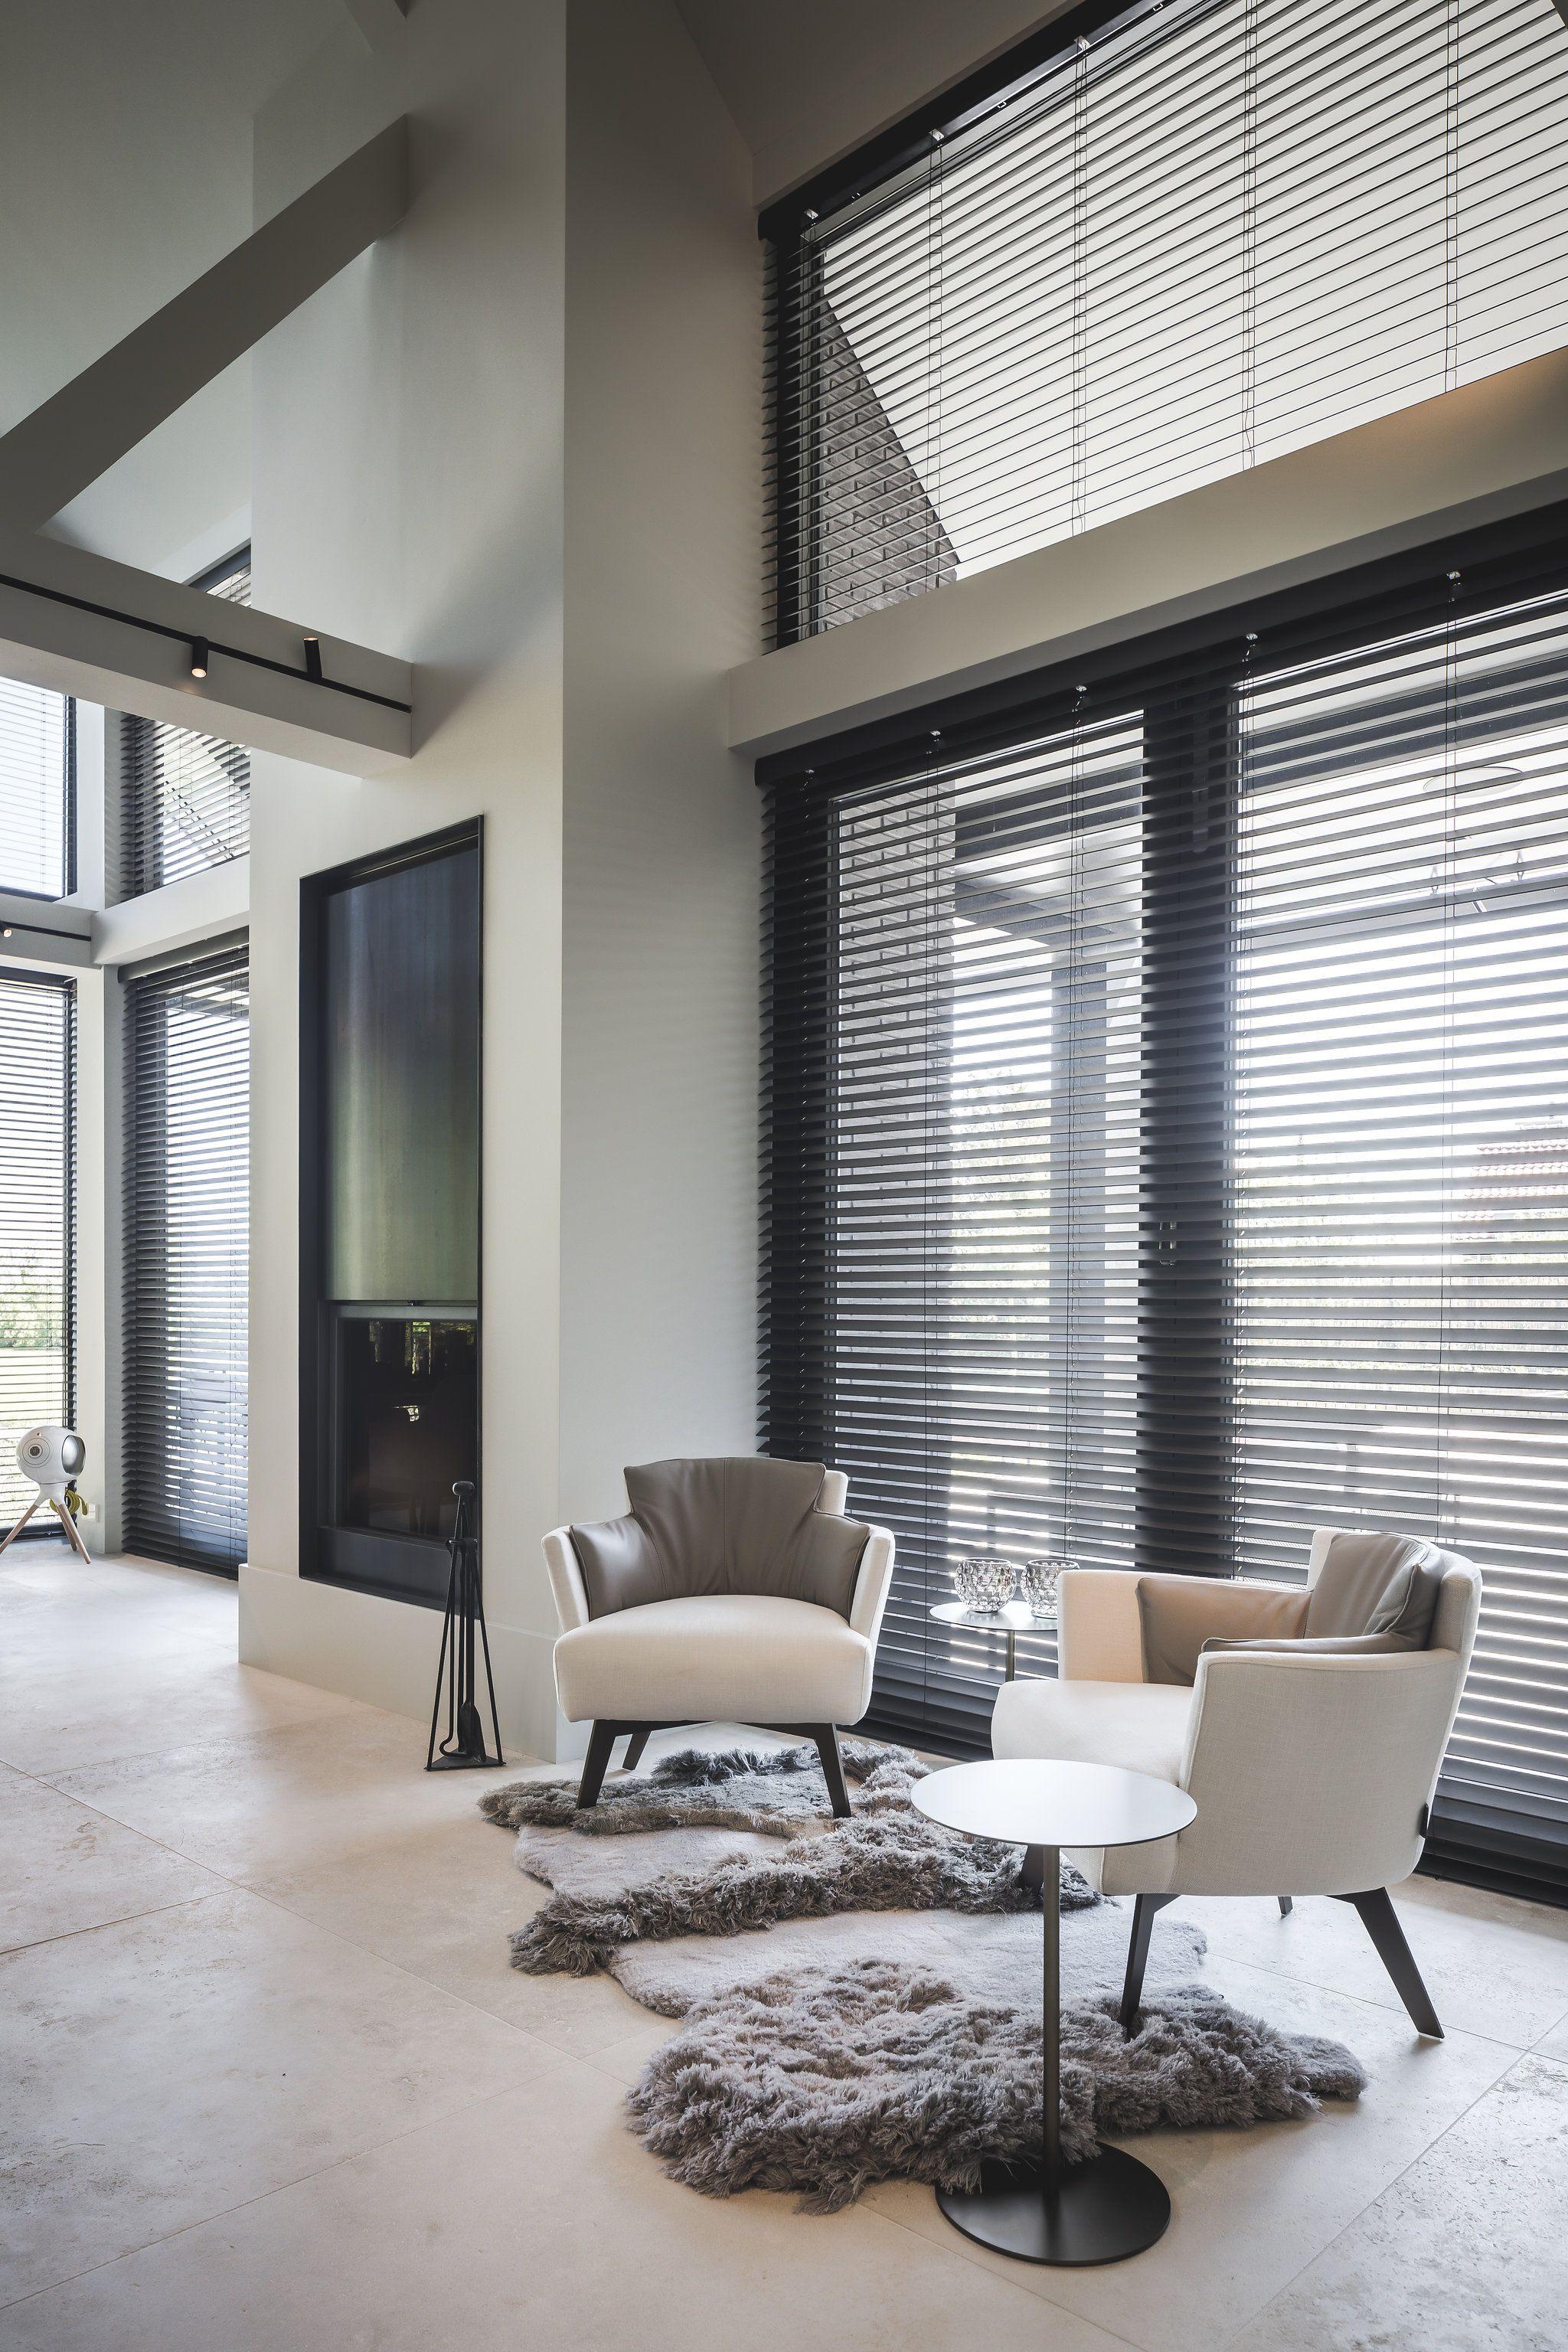 Comfortable and luxurious interior design. #bybertram #interiordesign #homeinspiration #woonidee #interieurinspiratie